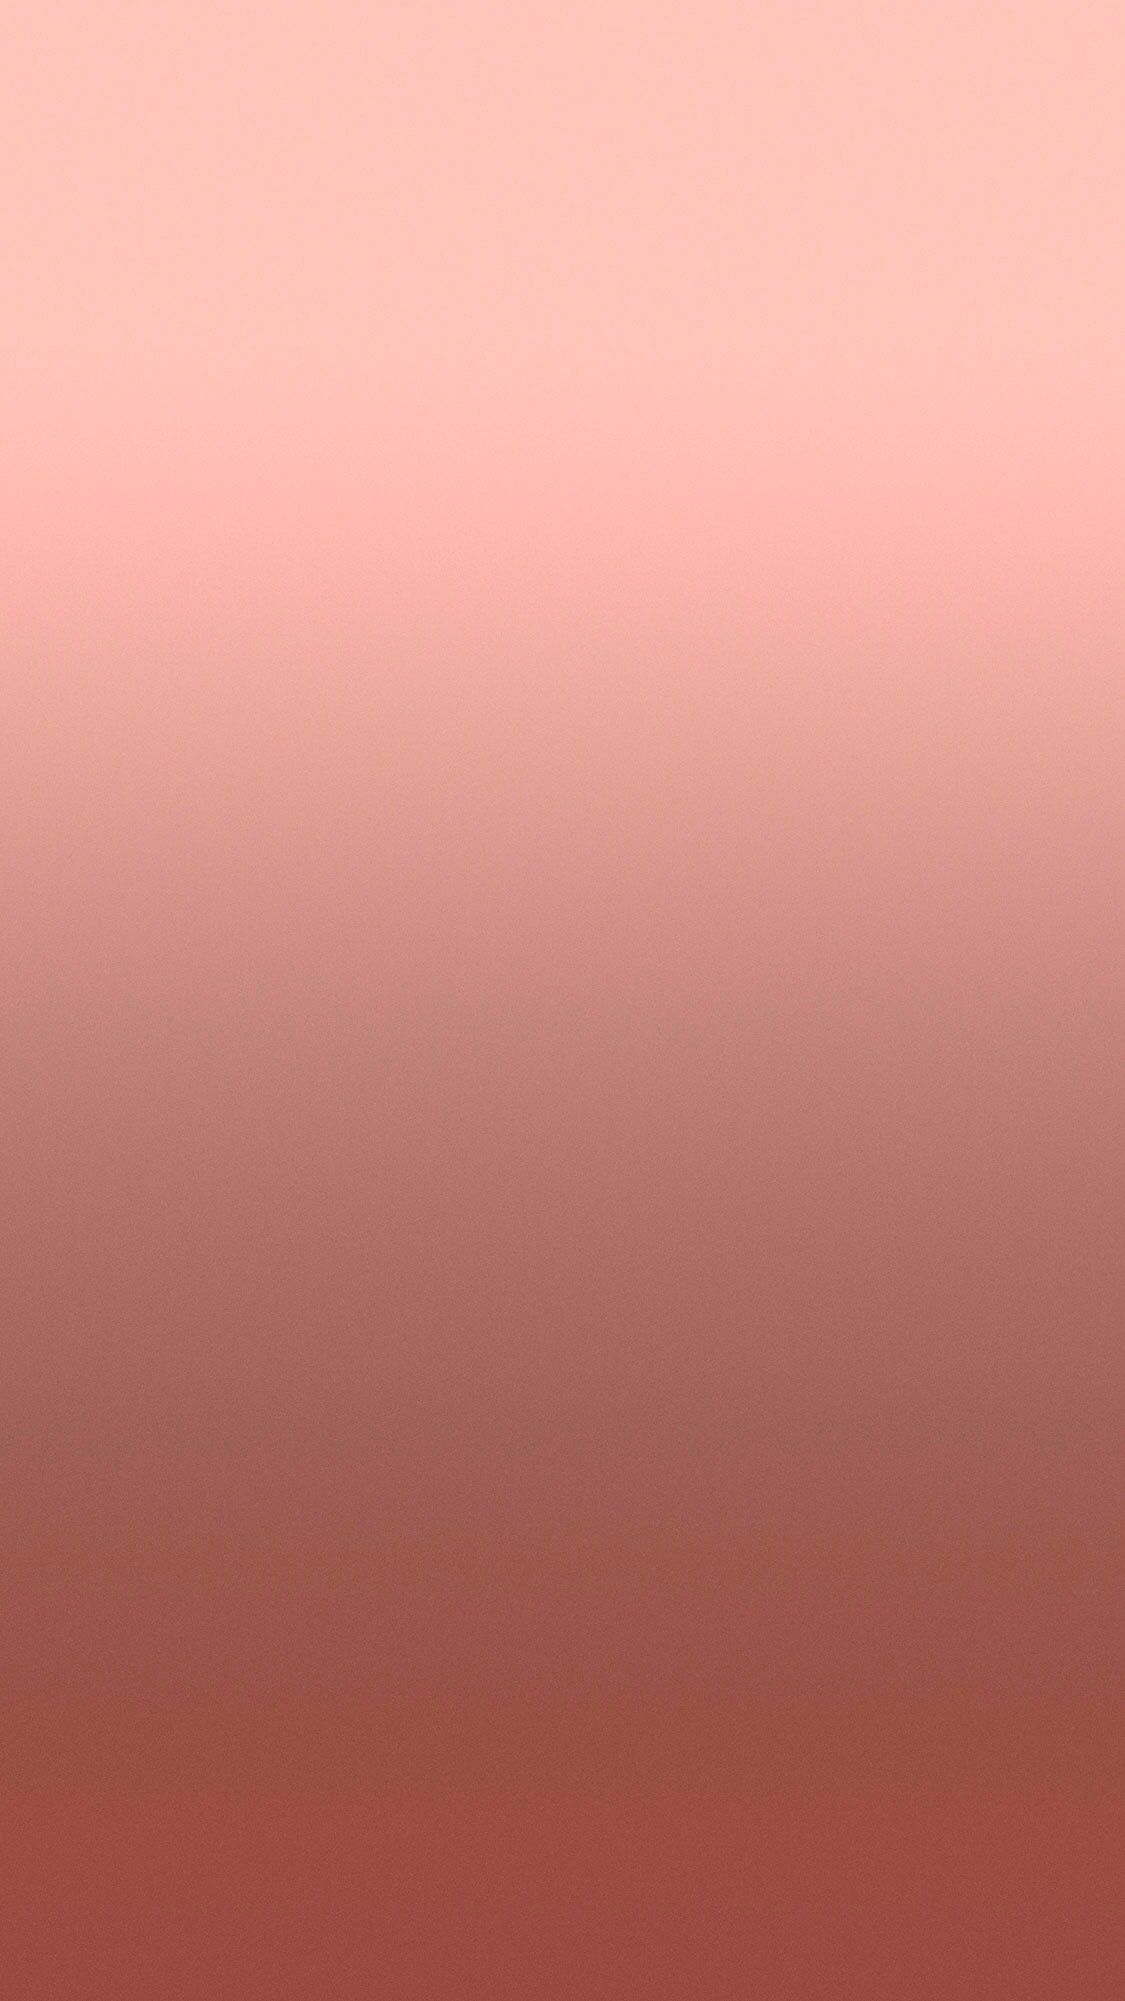 Rose Gold Gradient Backrounds 2 Fond Ecran Ecran Iphone Fond D